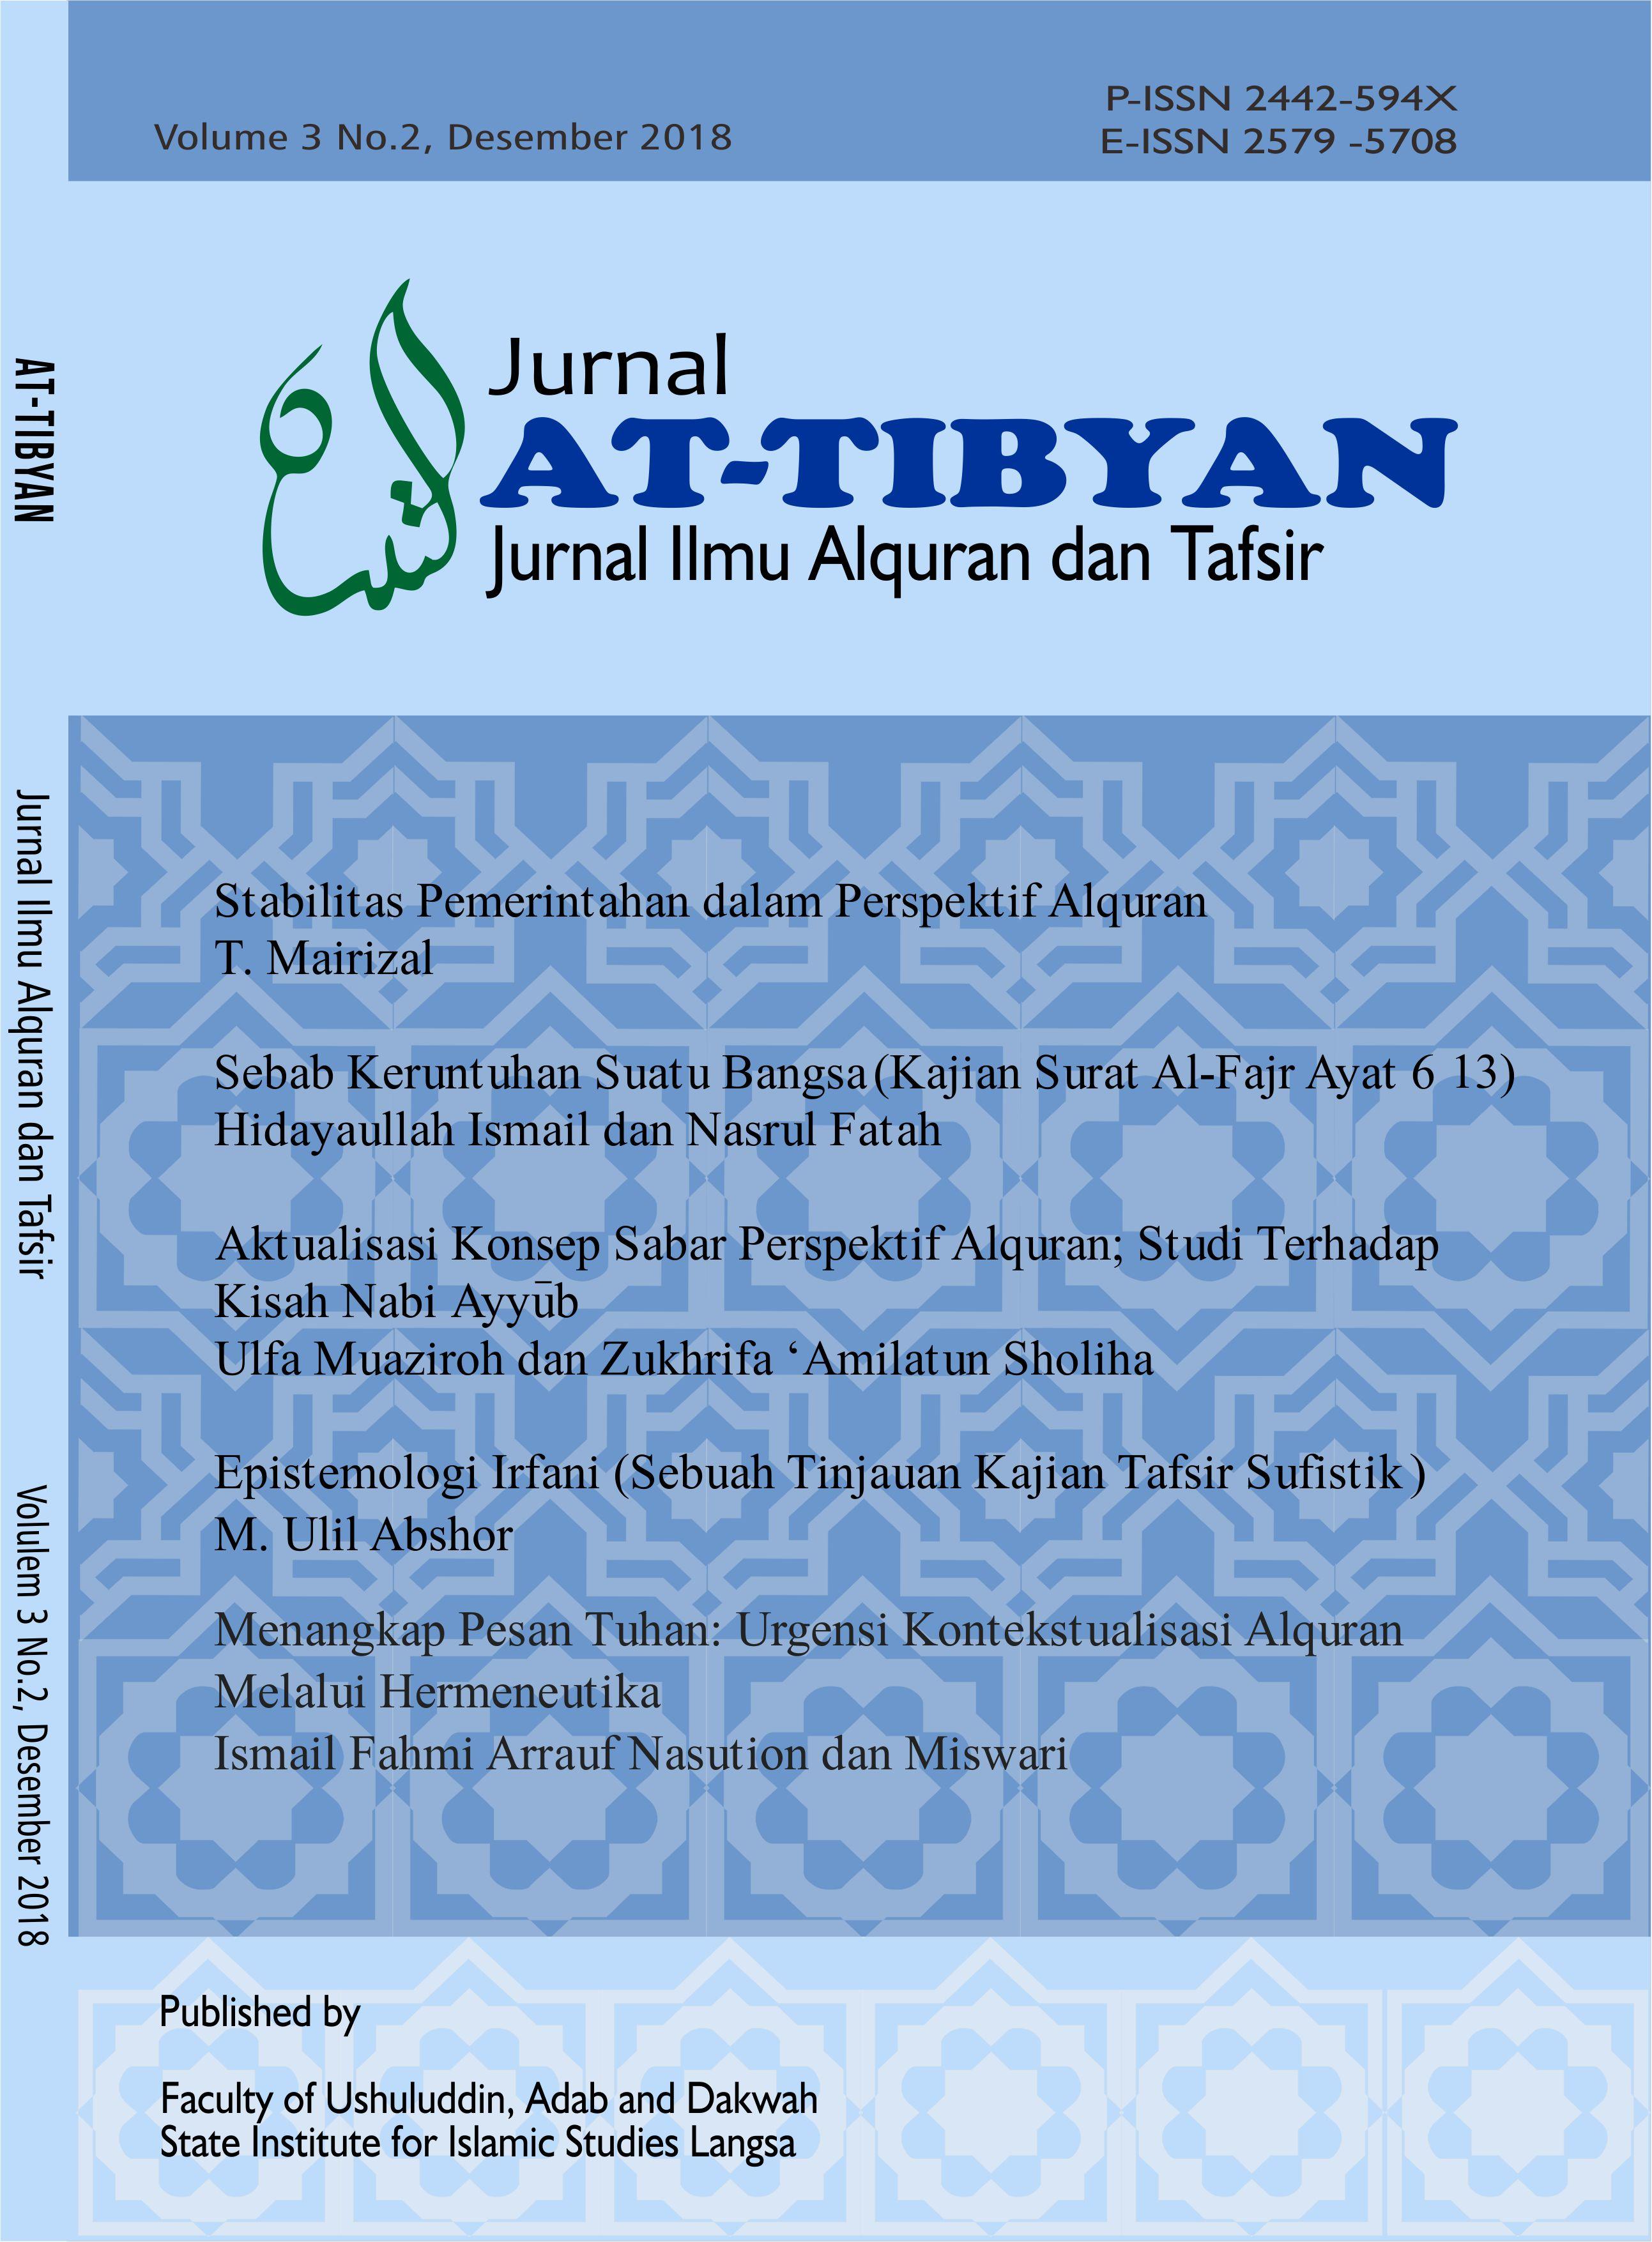 Pdf indonesia jurnal bahasa